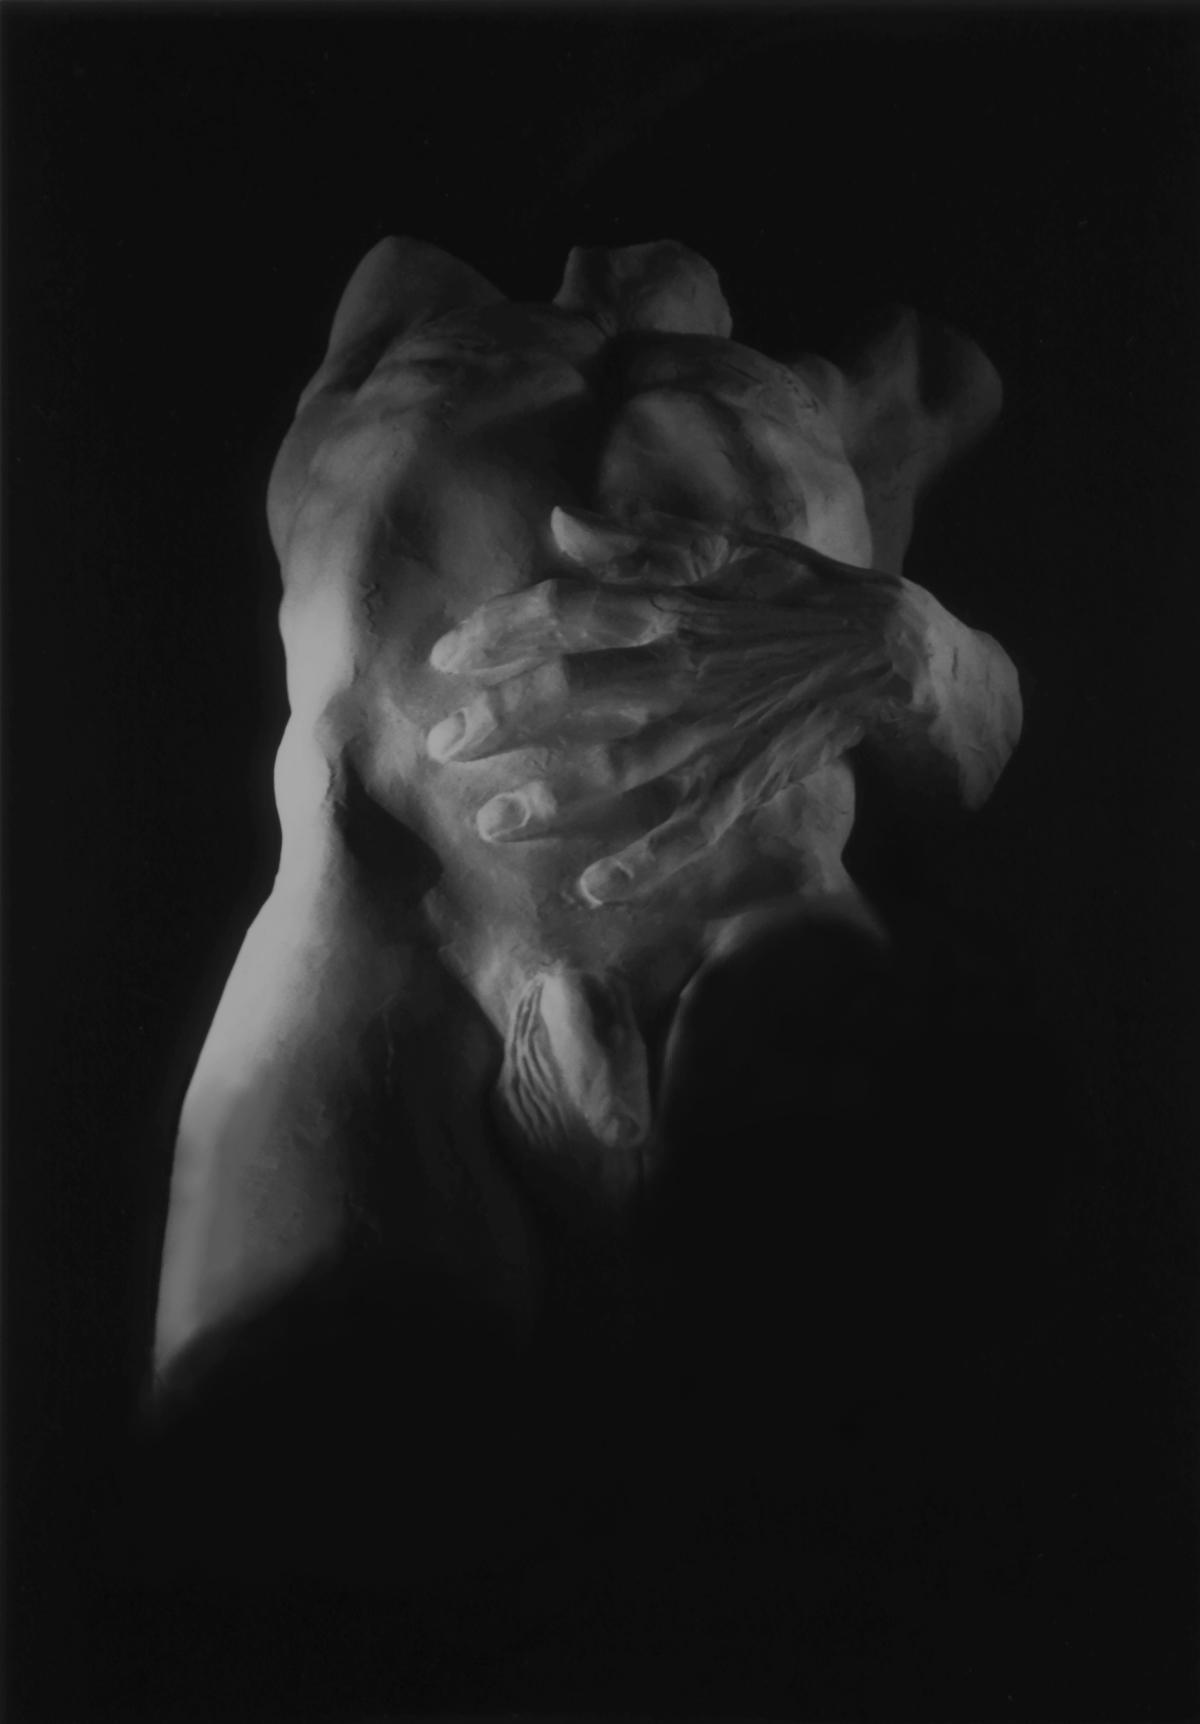 Elena-Mutinelli-15-etra-studio-tommasi